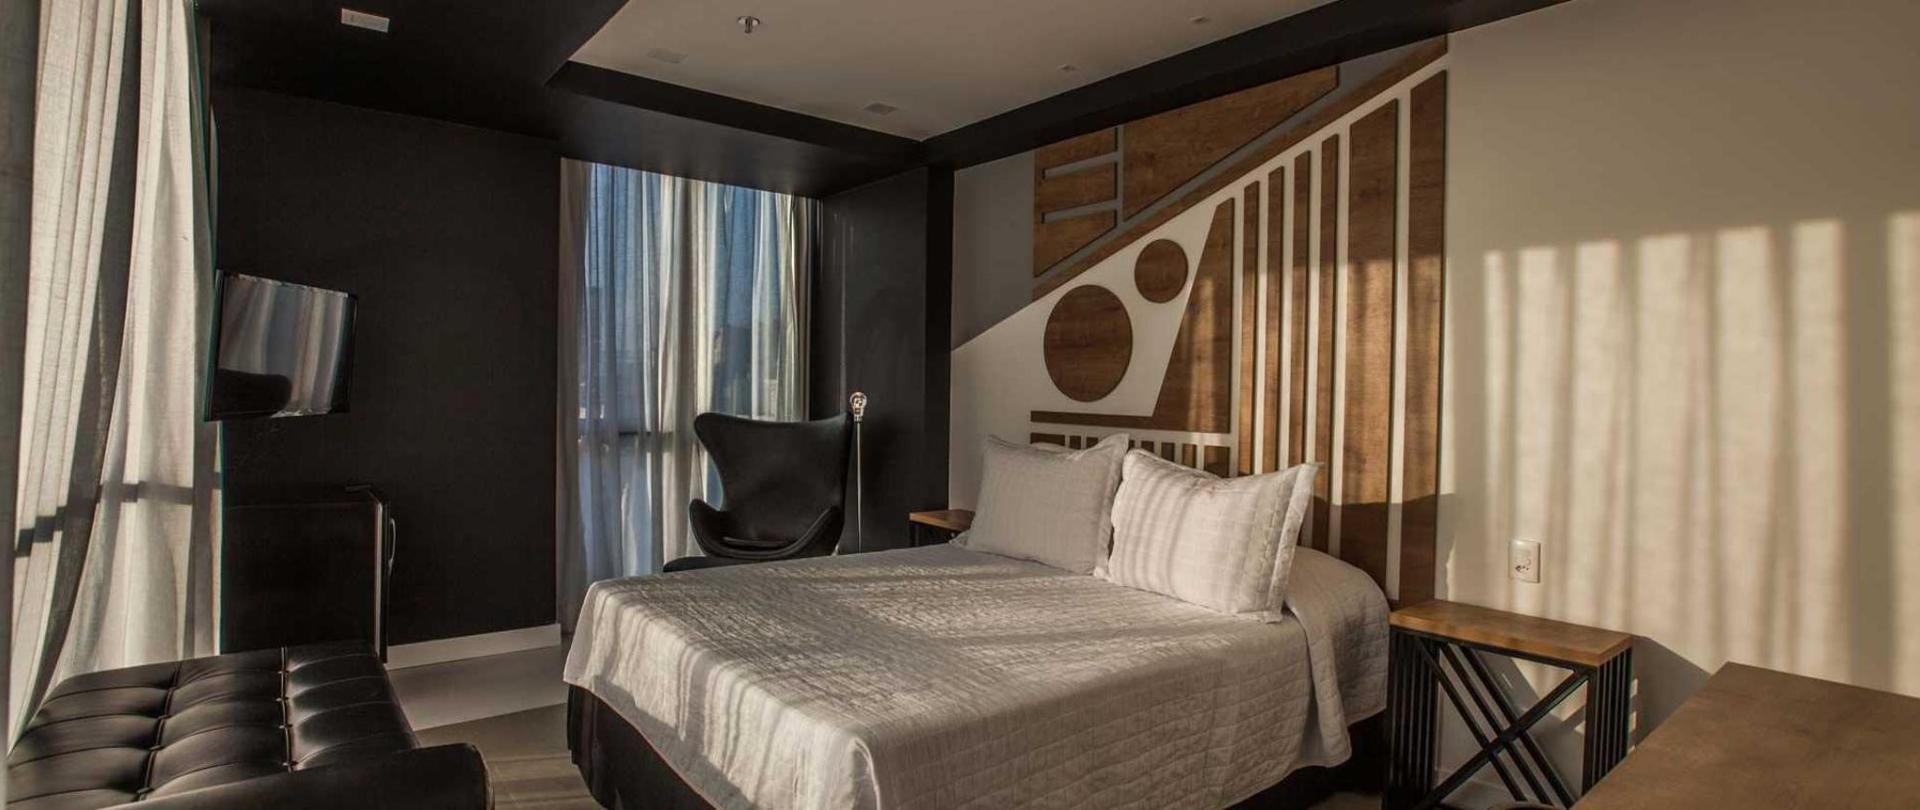 Rio Hôtel Design